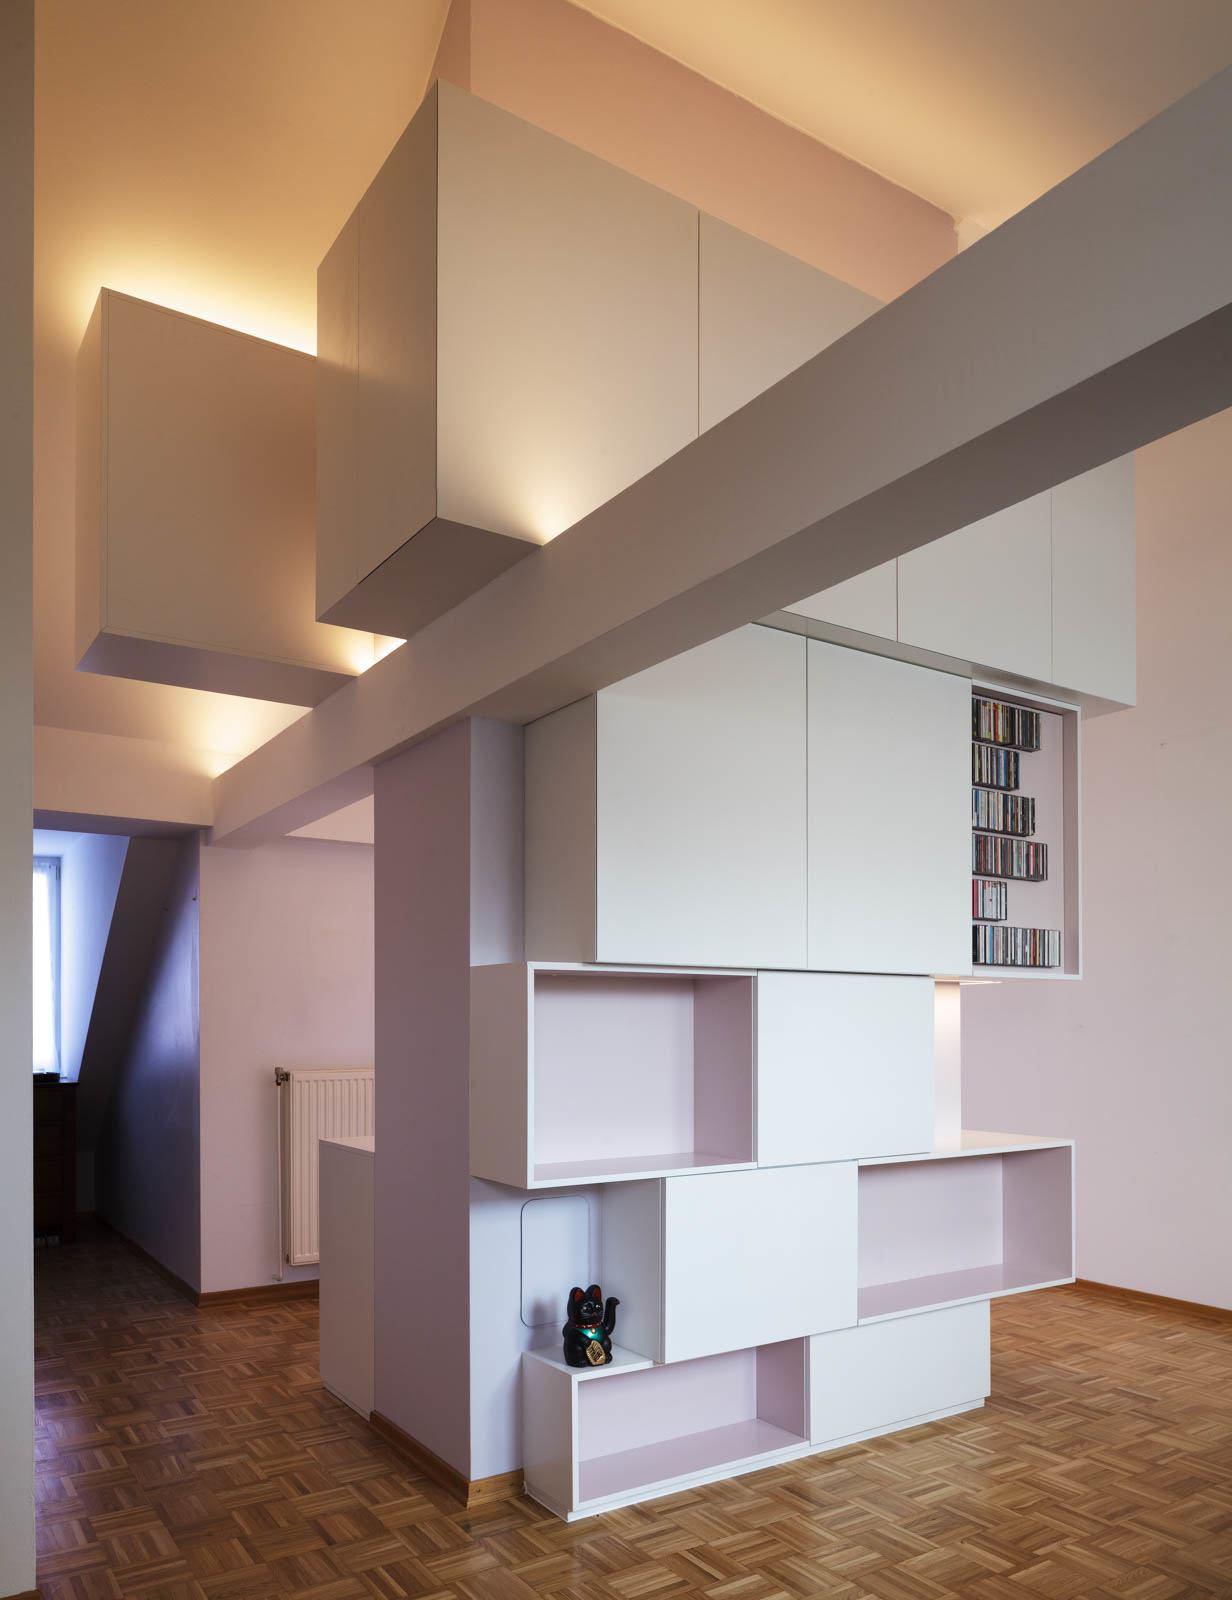 Turm-Regal, Christof Schlegel